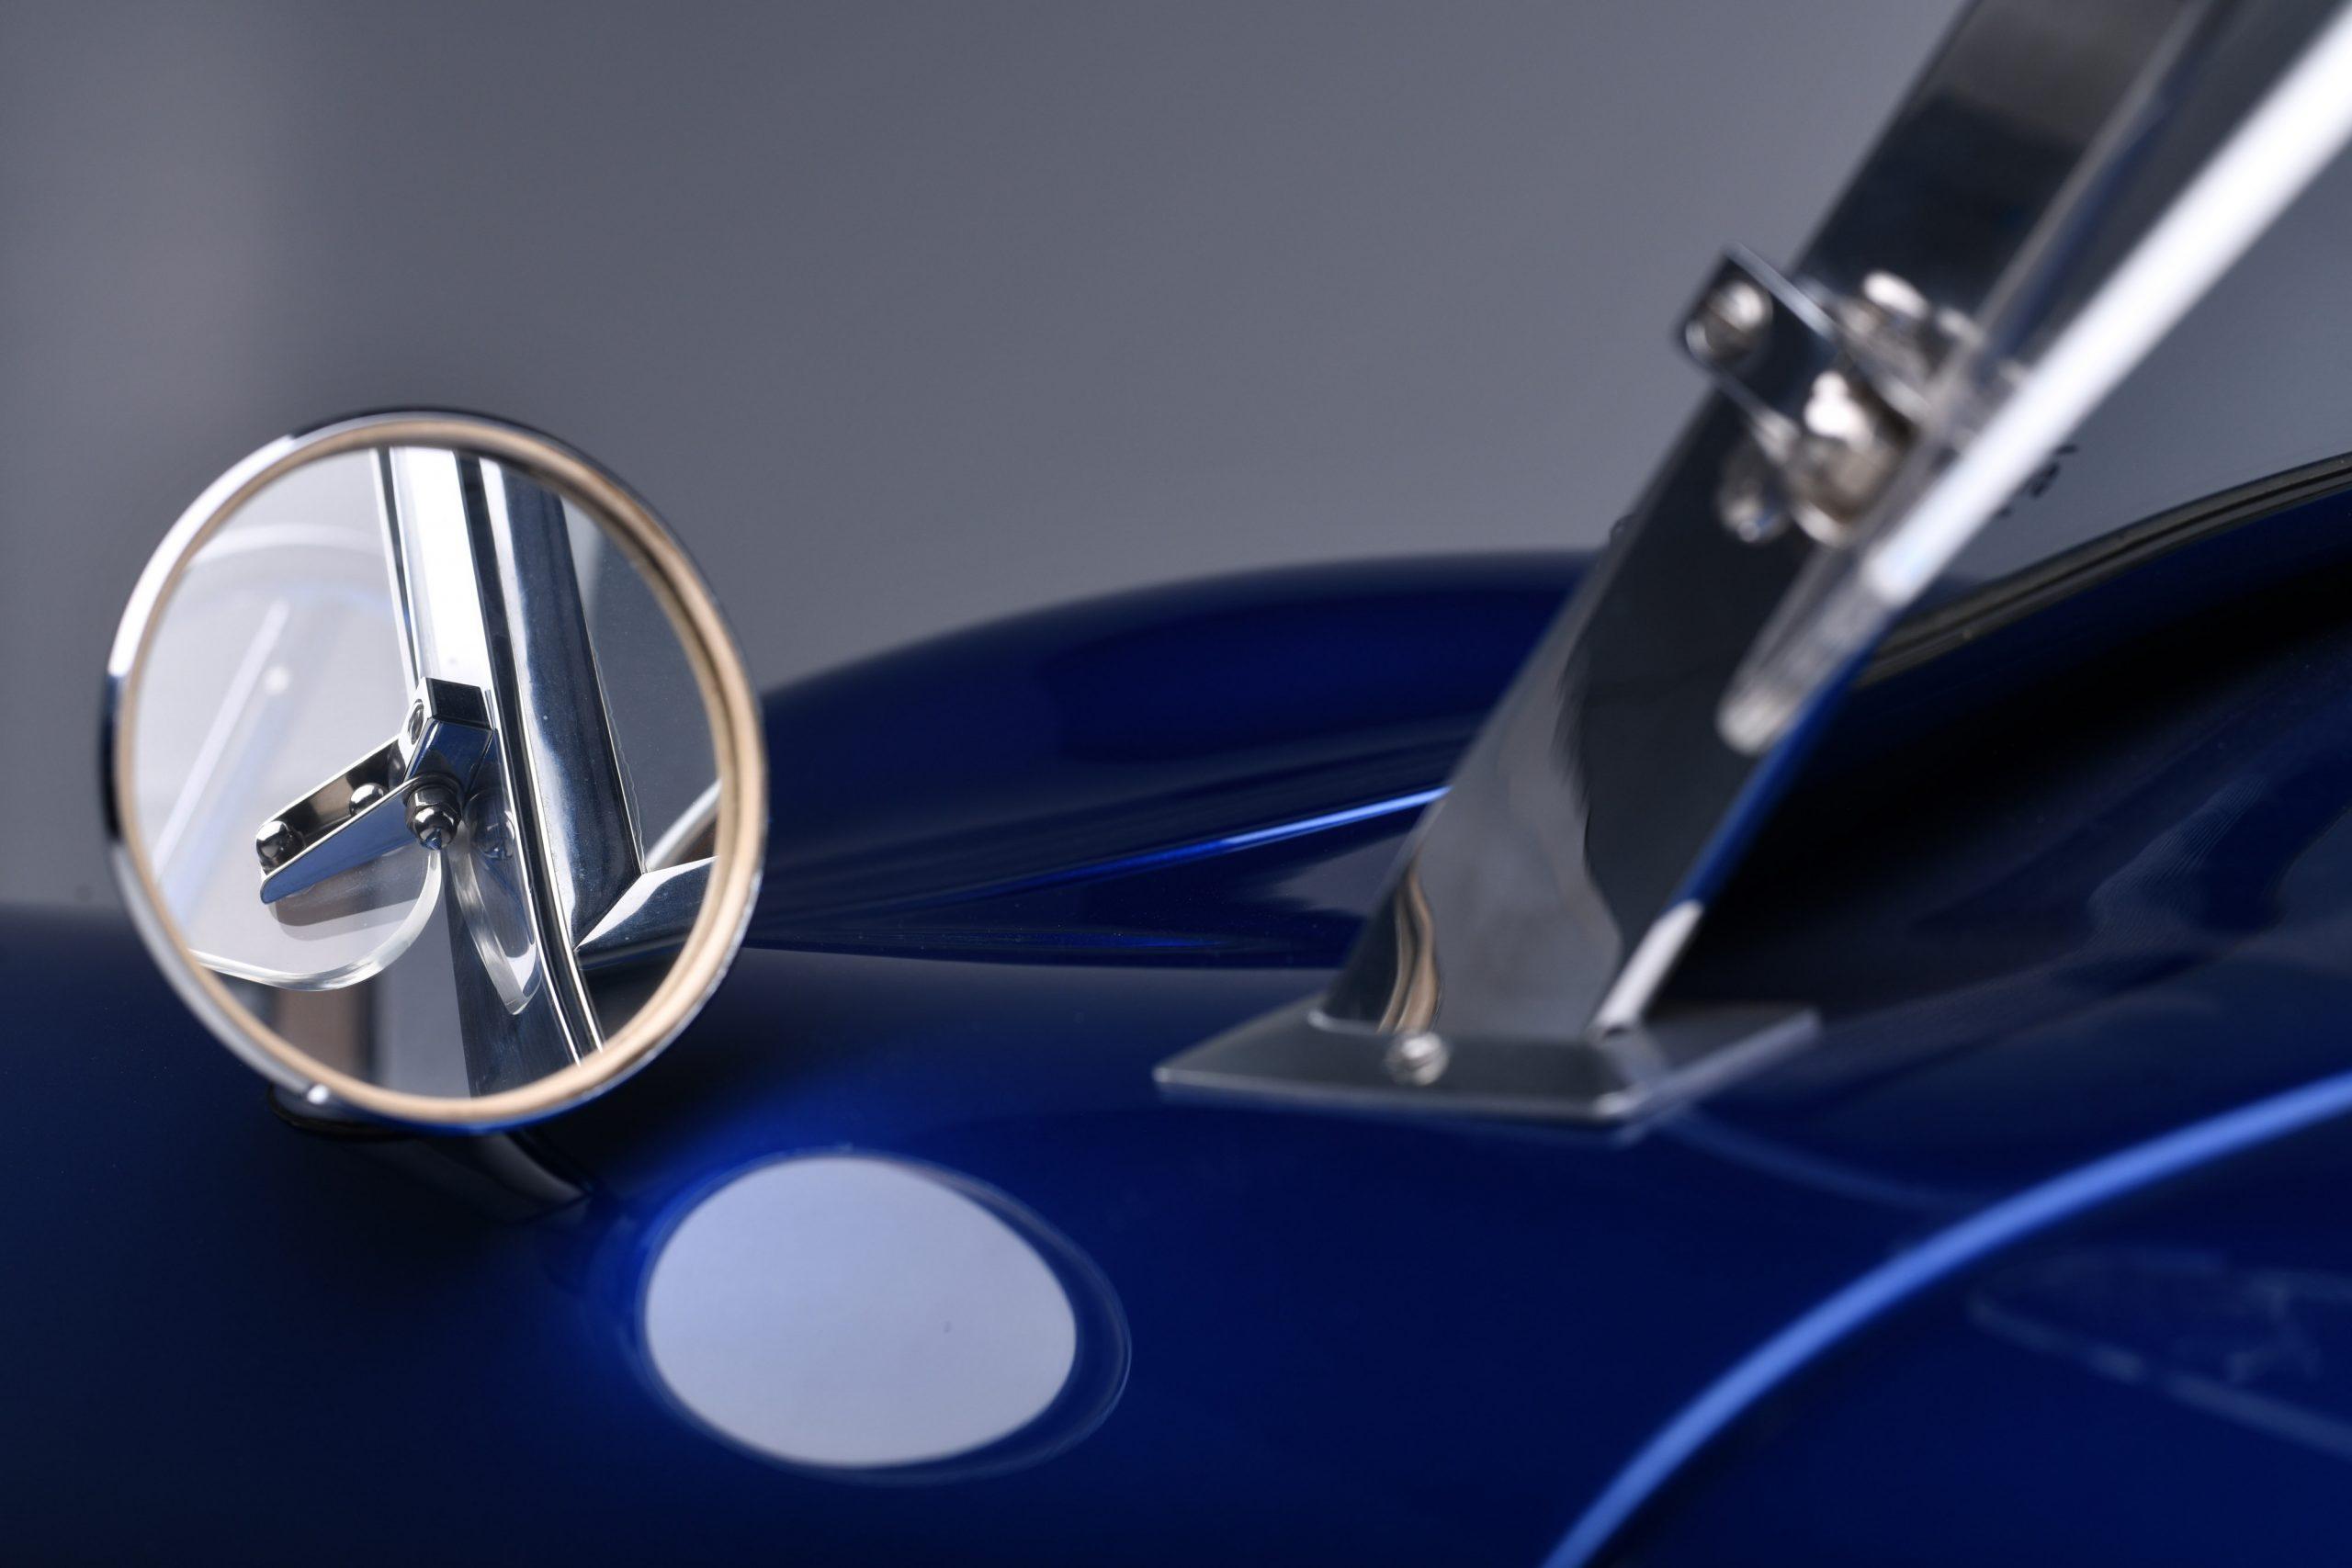 CSX 3015 Shelby Cobra side mirror detail